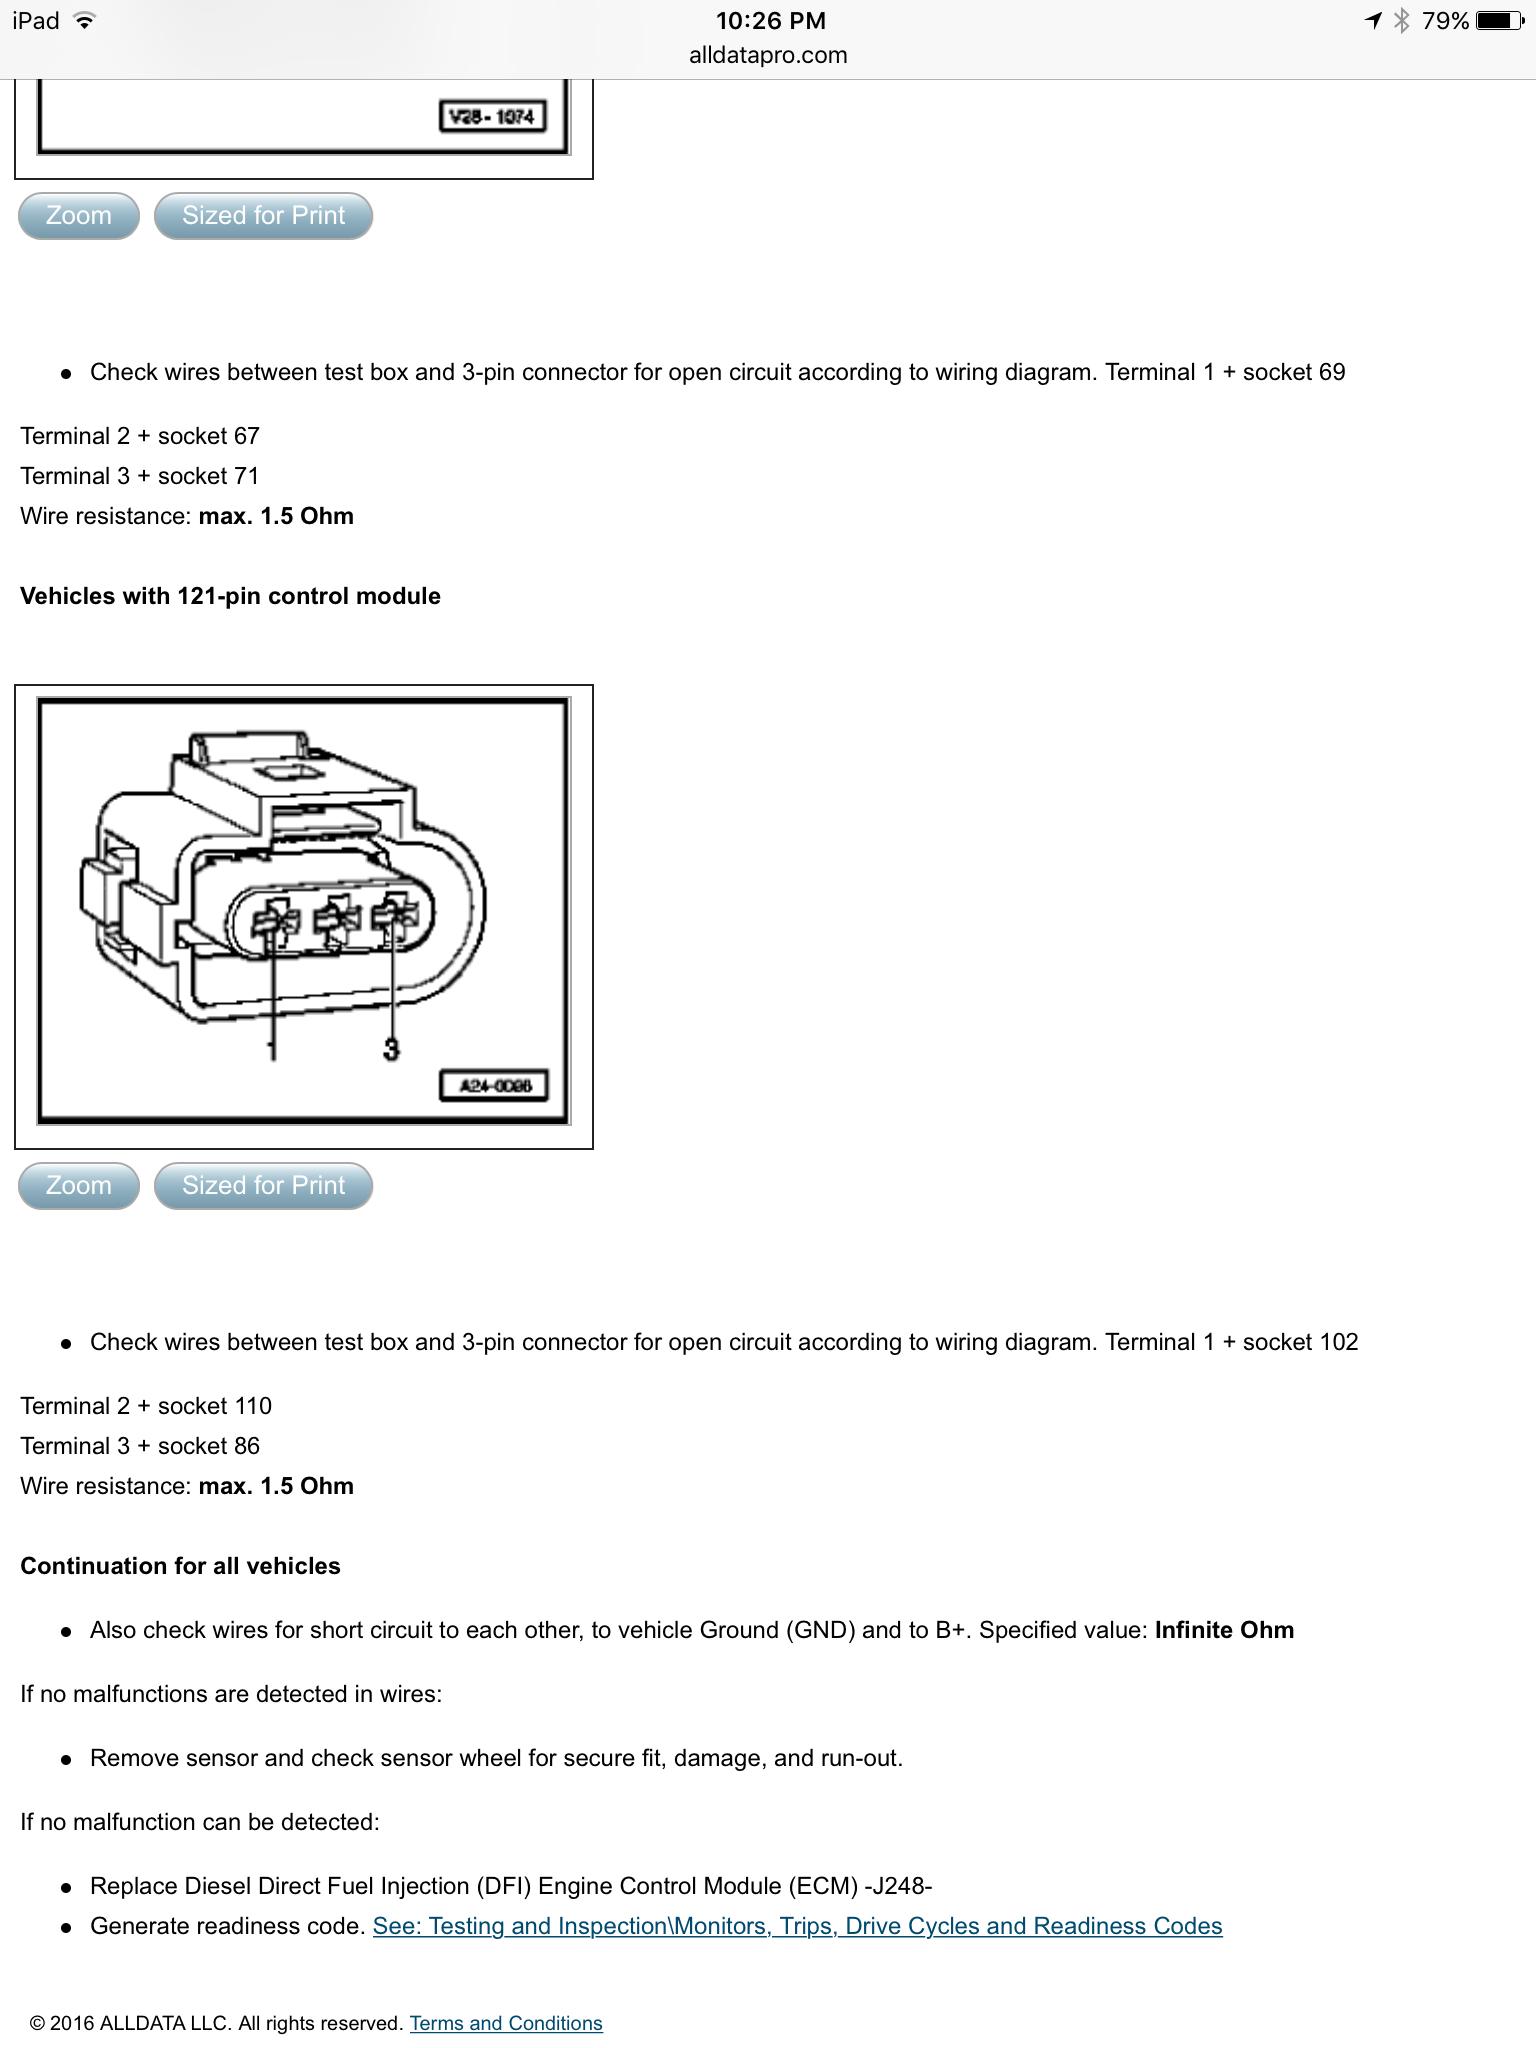 How to test crank sensor   TDIClub ForumsTDIClub Forums